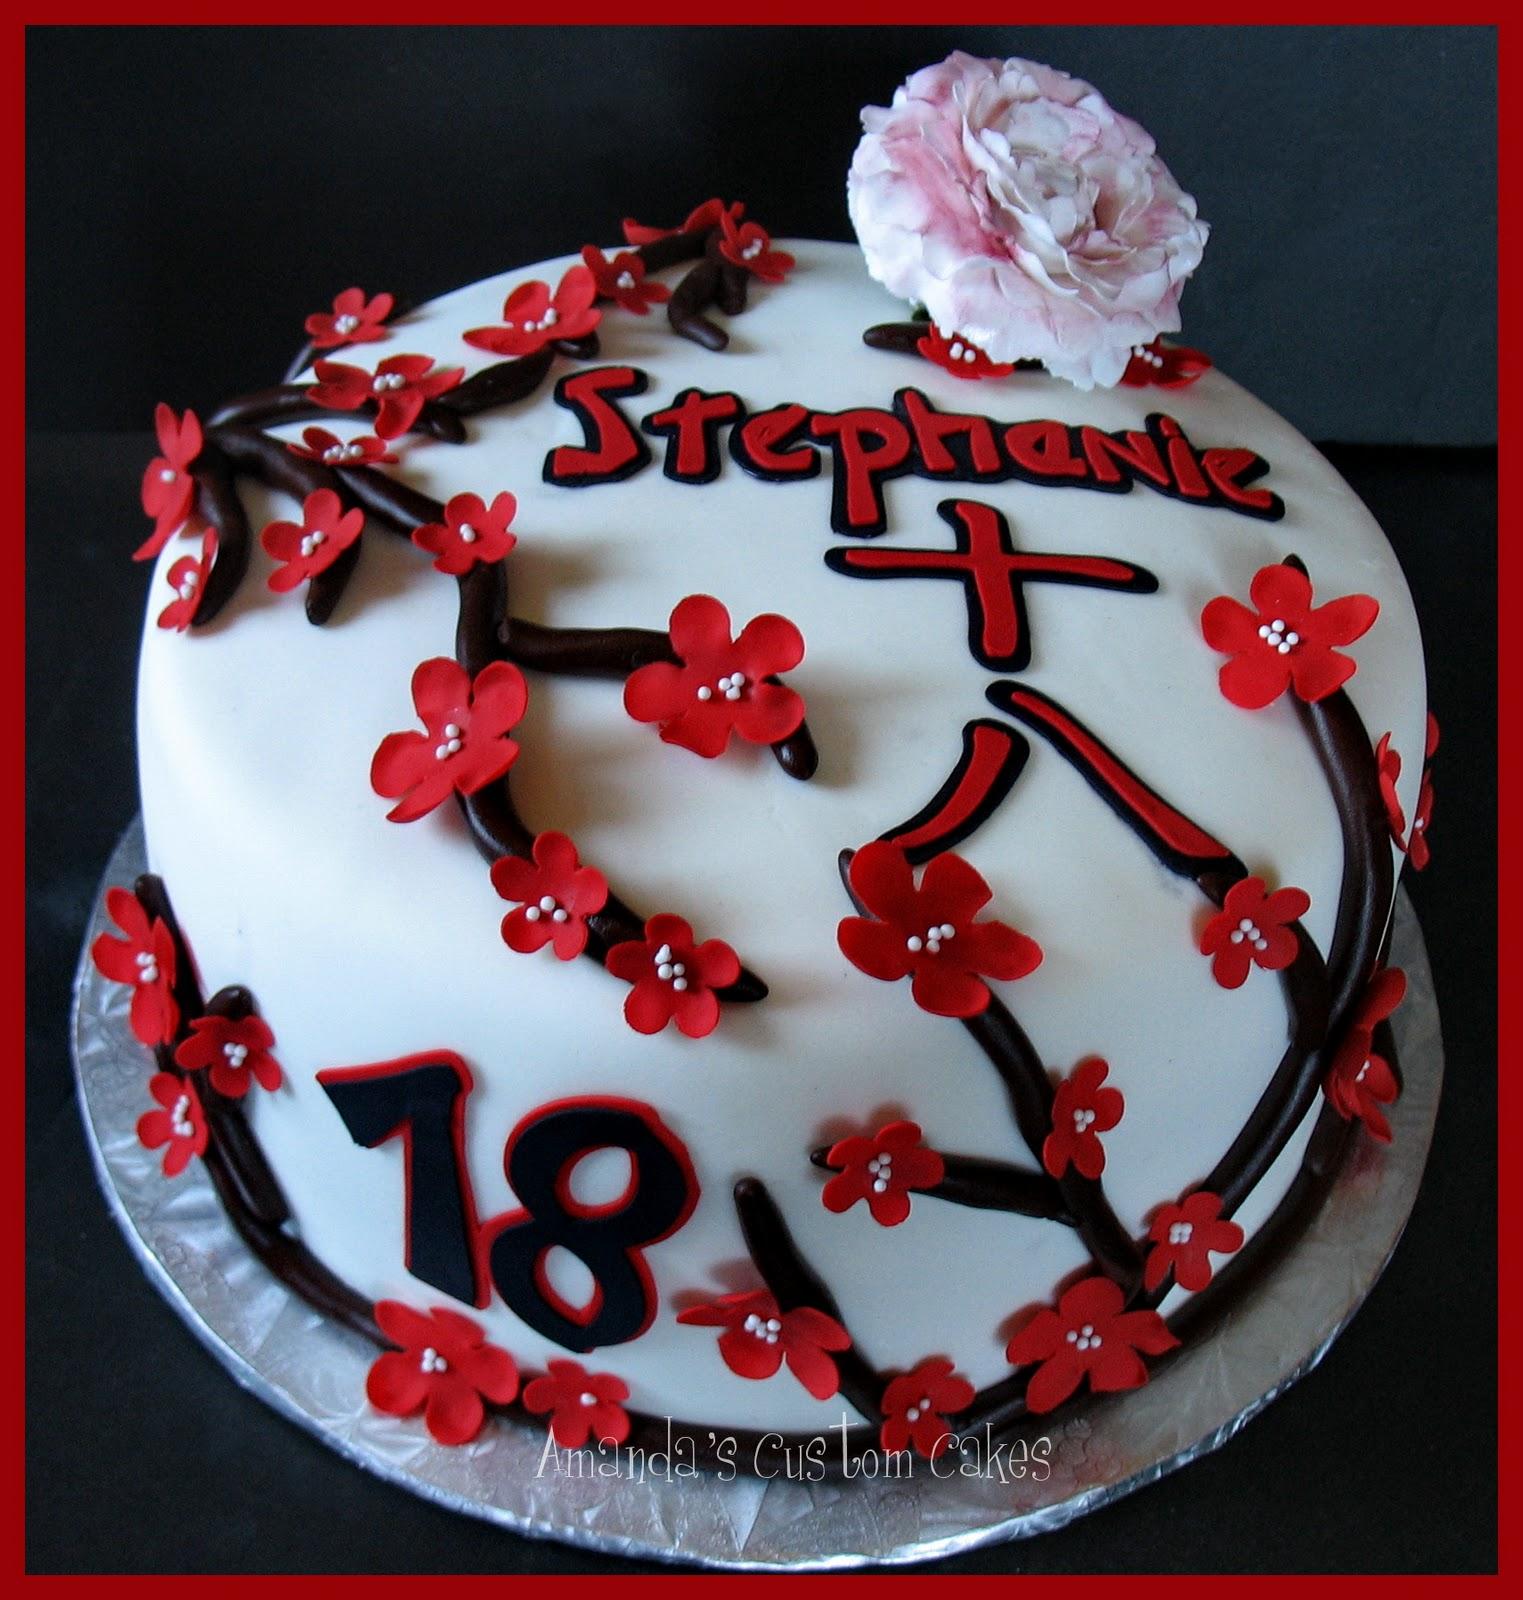 Amanda's Custom Cakes: Japanese Themed Birthday Cake